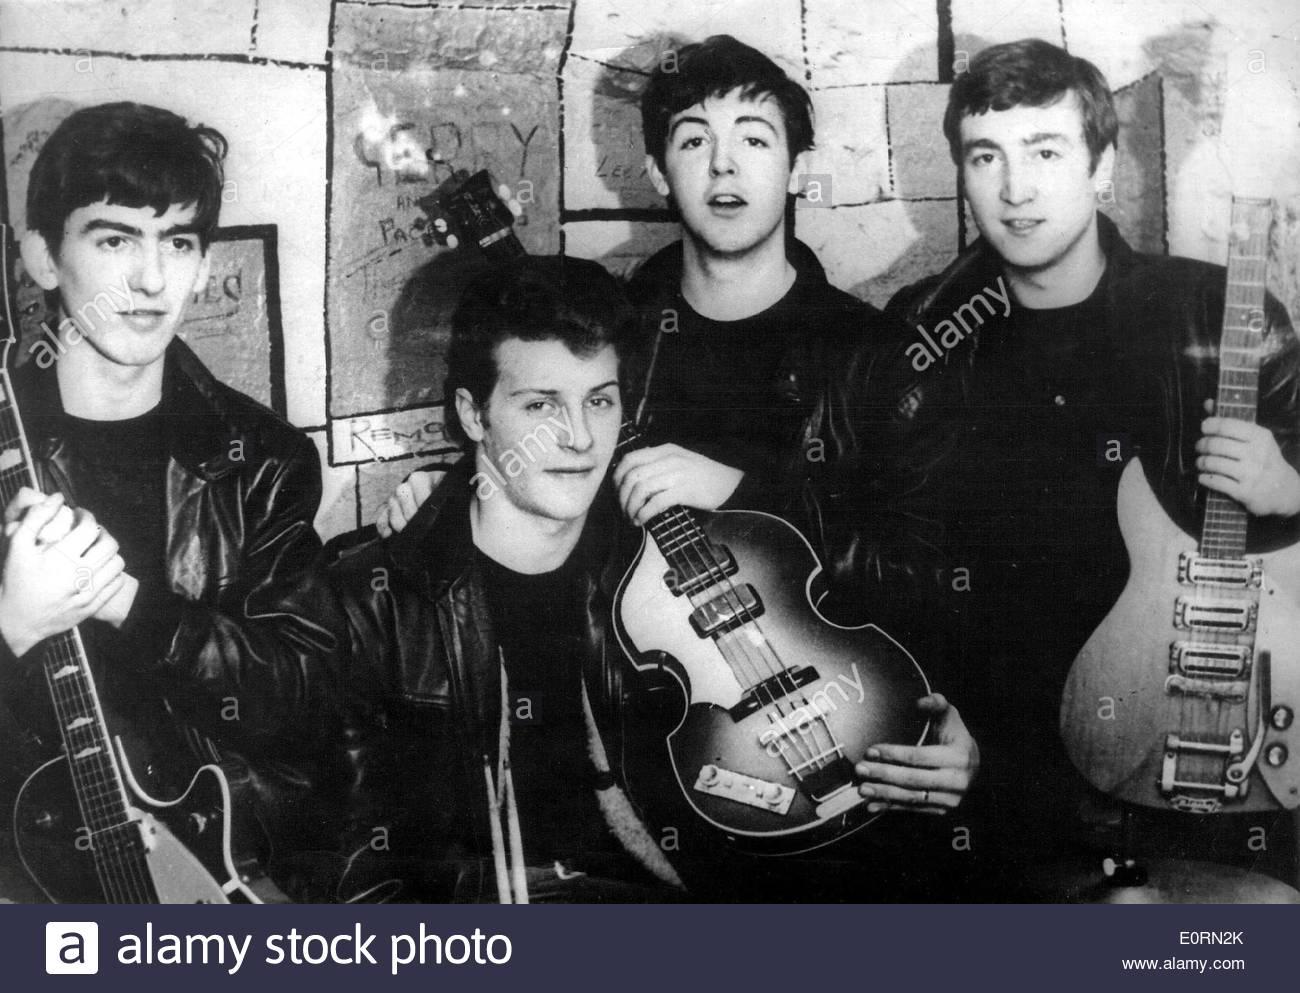 The Beatles original members, George Harrison, Pete Best, Paul McCartney, John Lennon - Stock Image